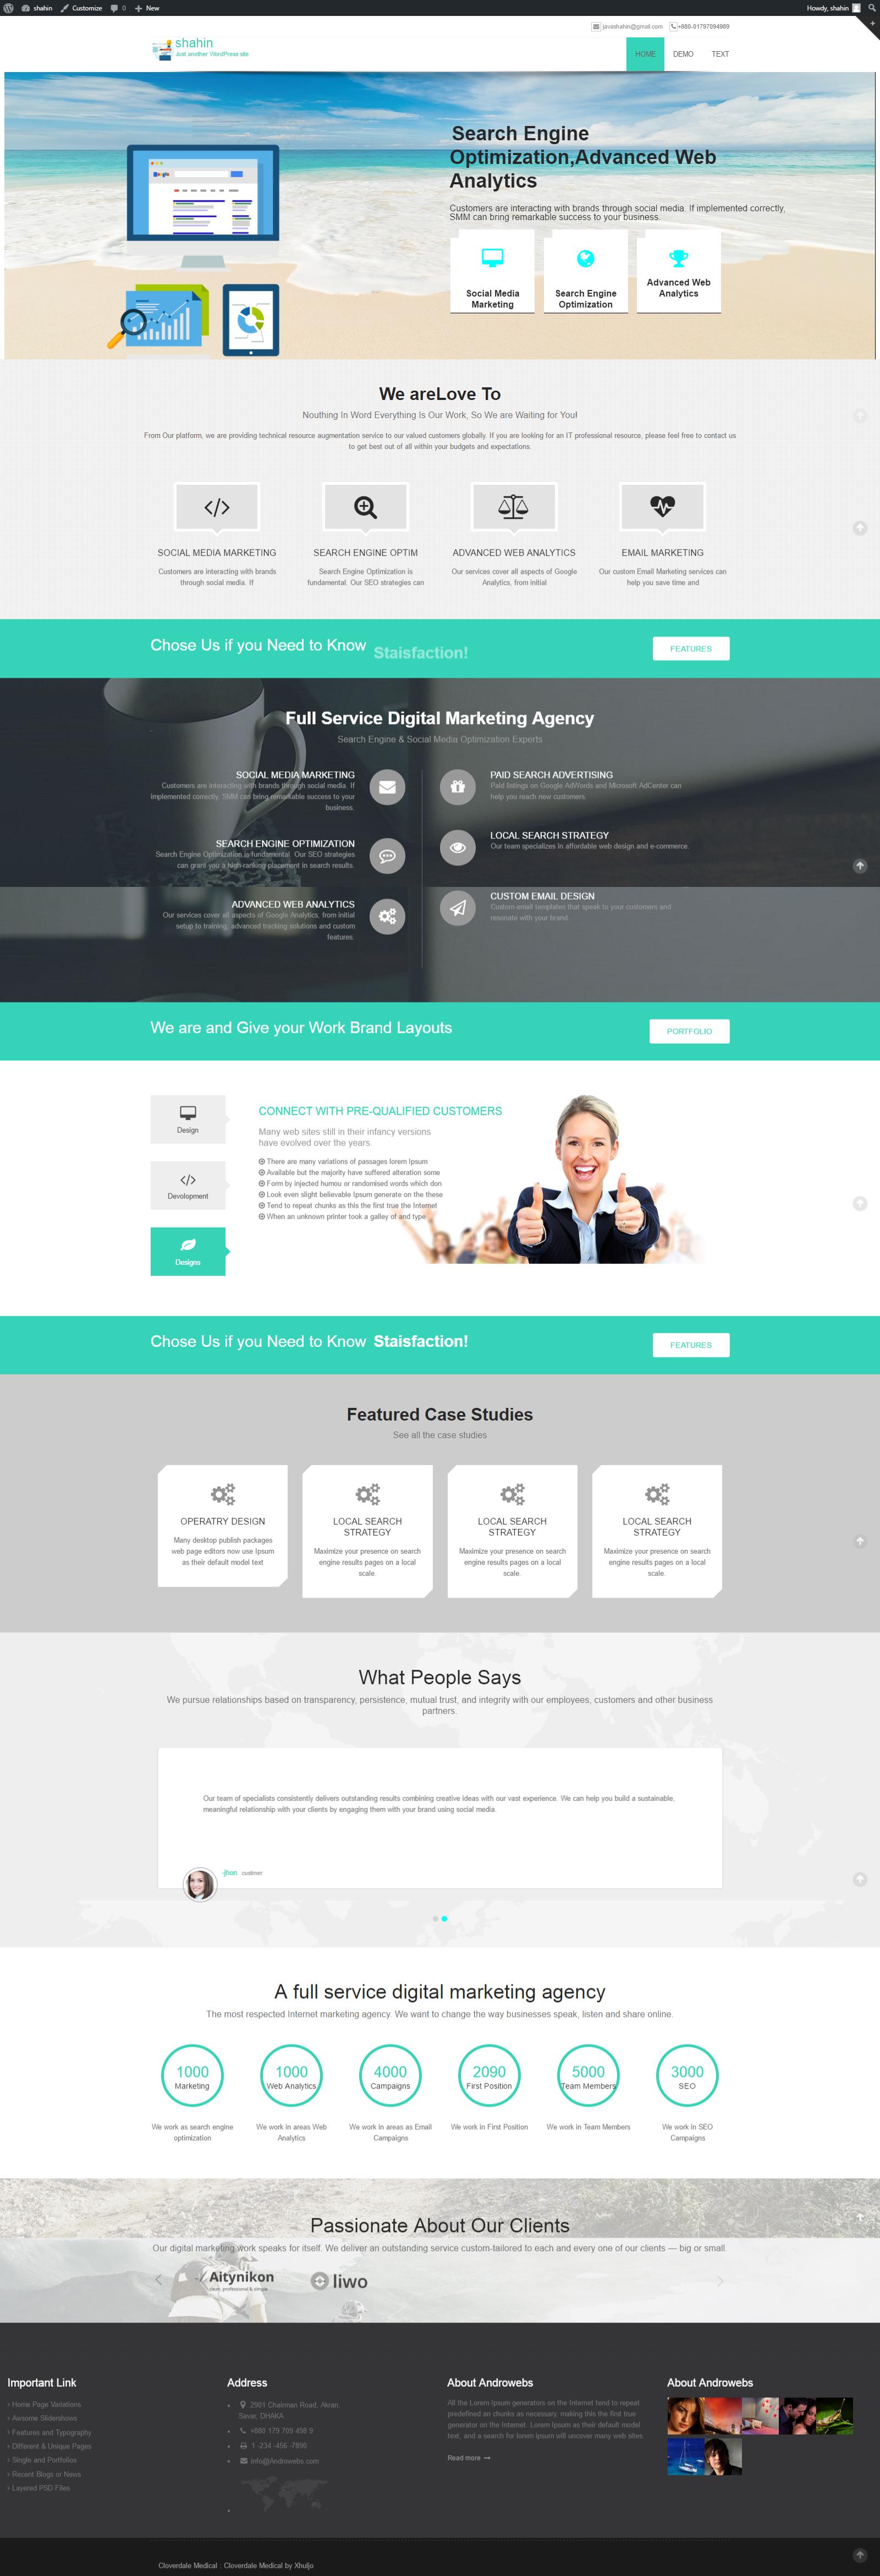 Seo Agency Wordpress Theme full responsive